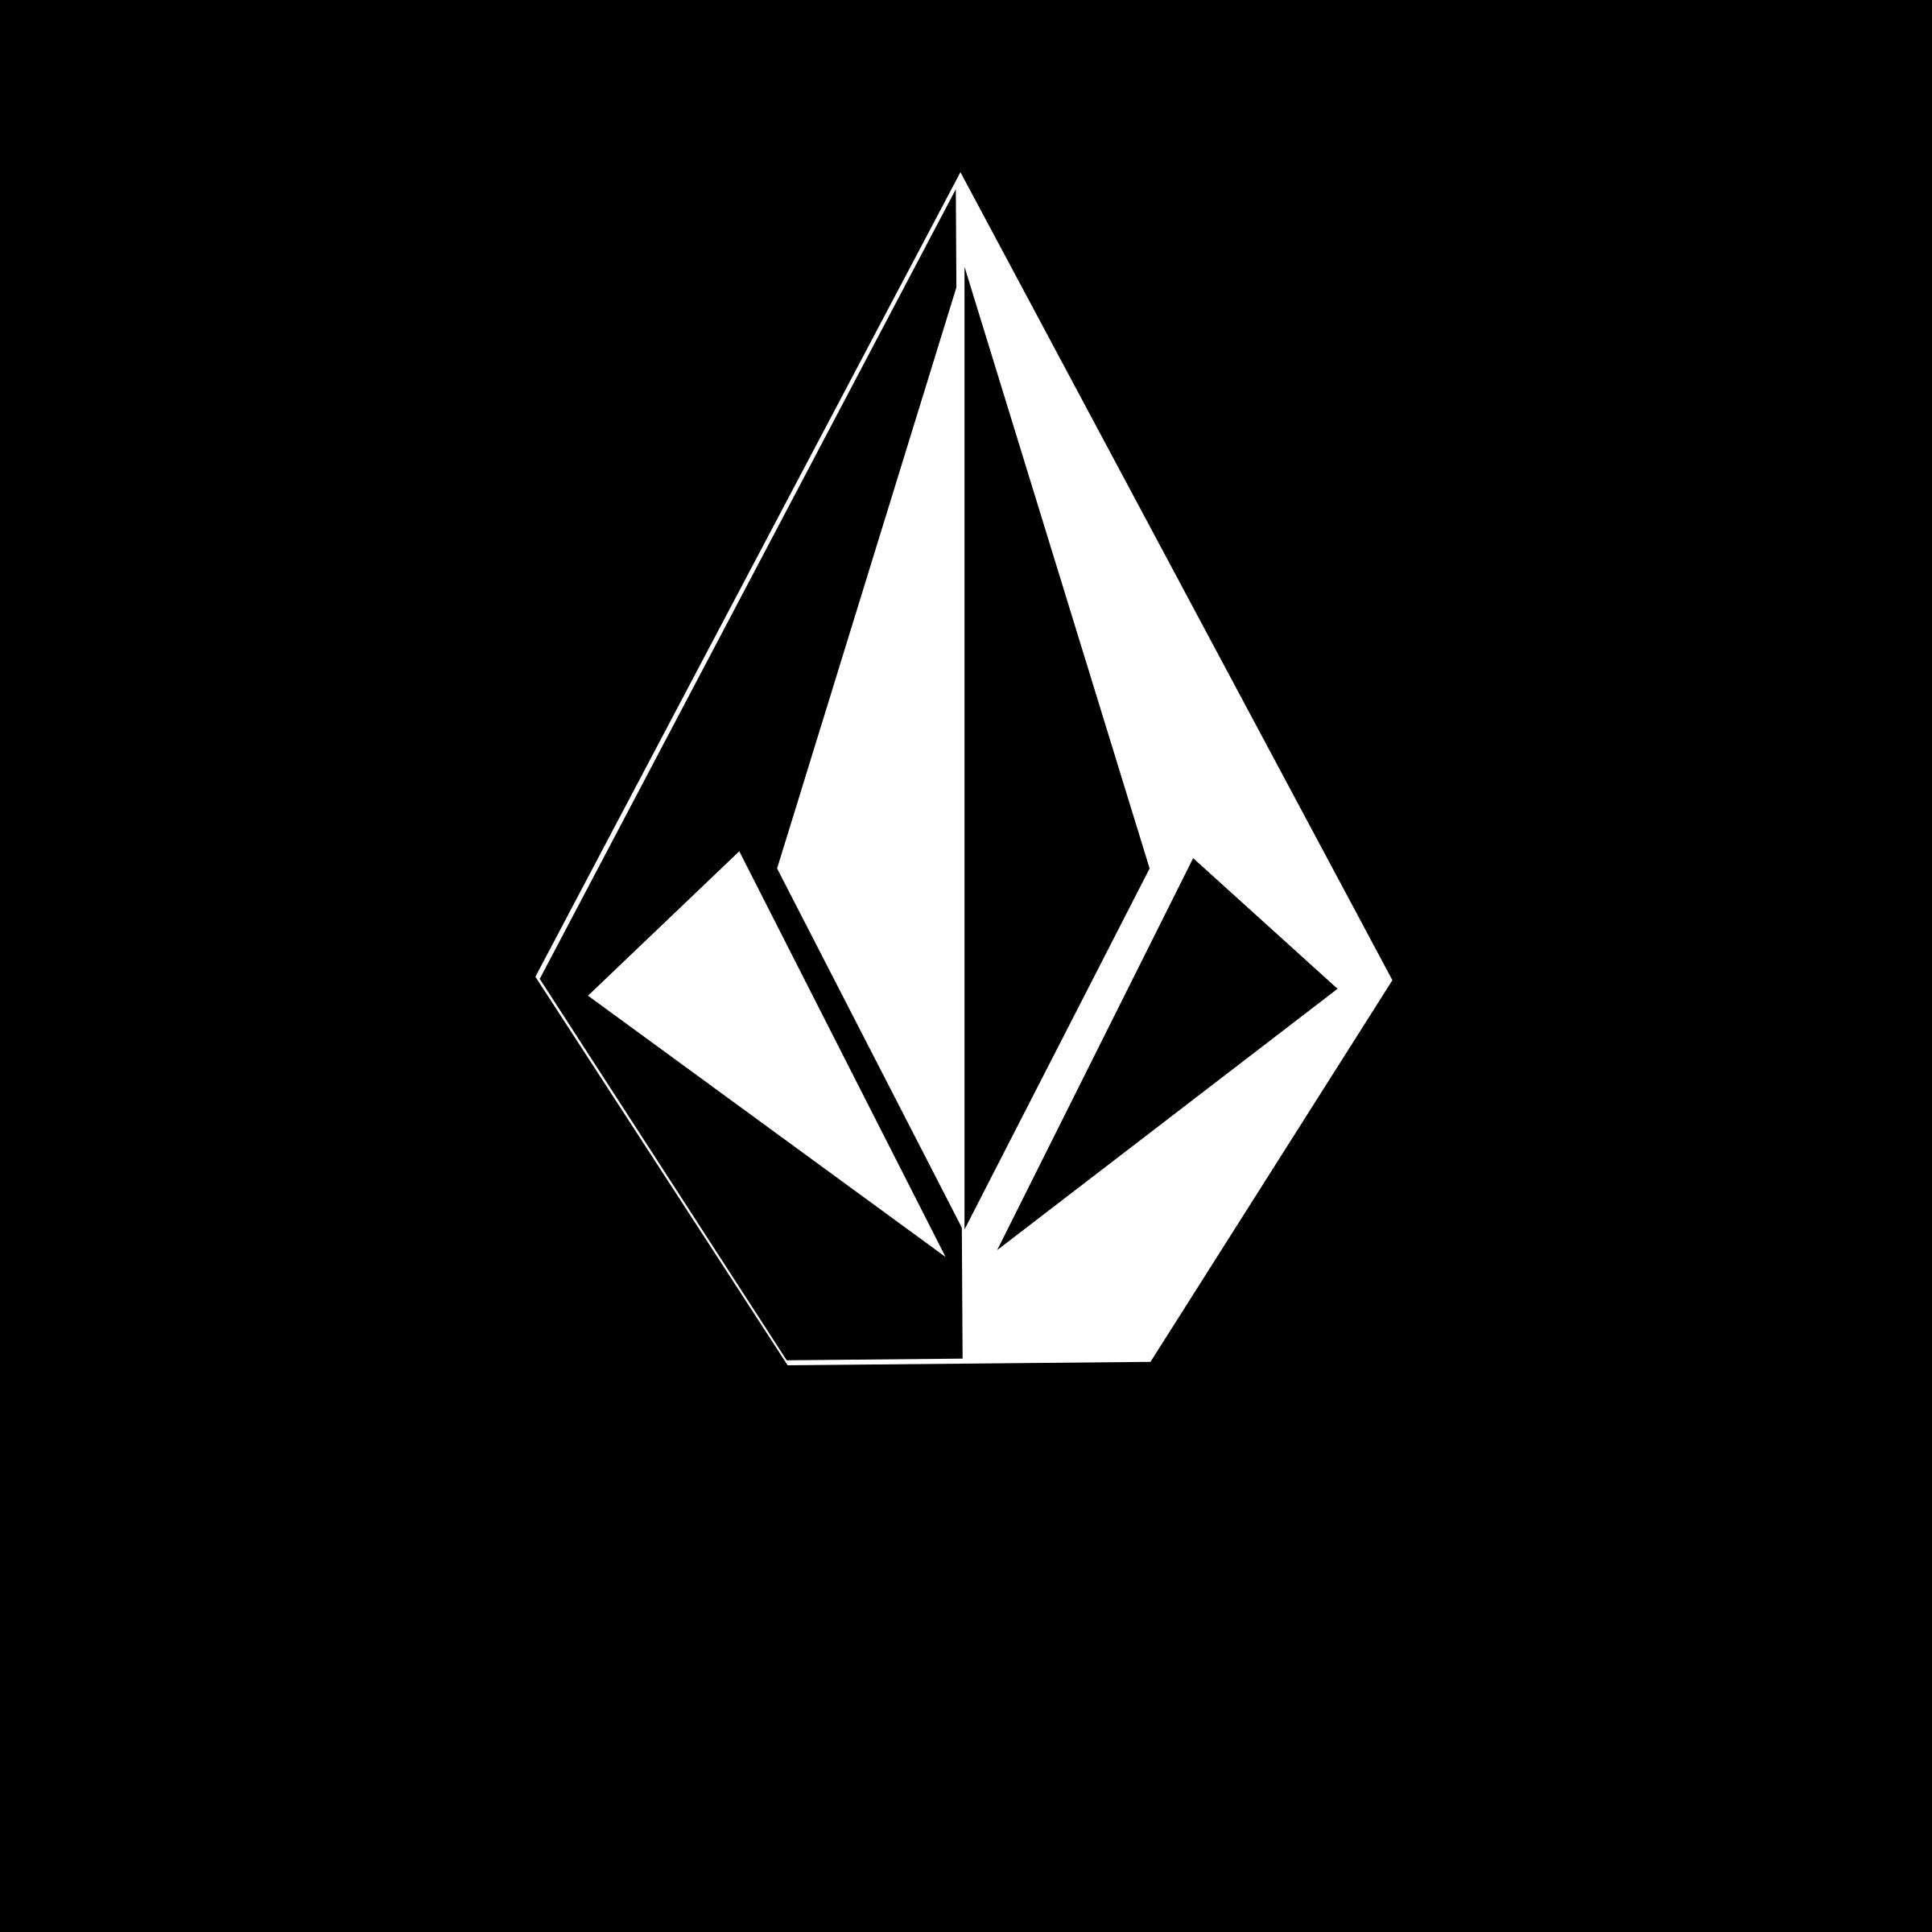 volcom-logo-png-transparent-2.png